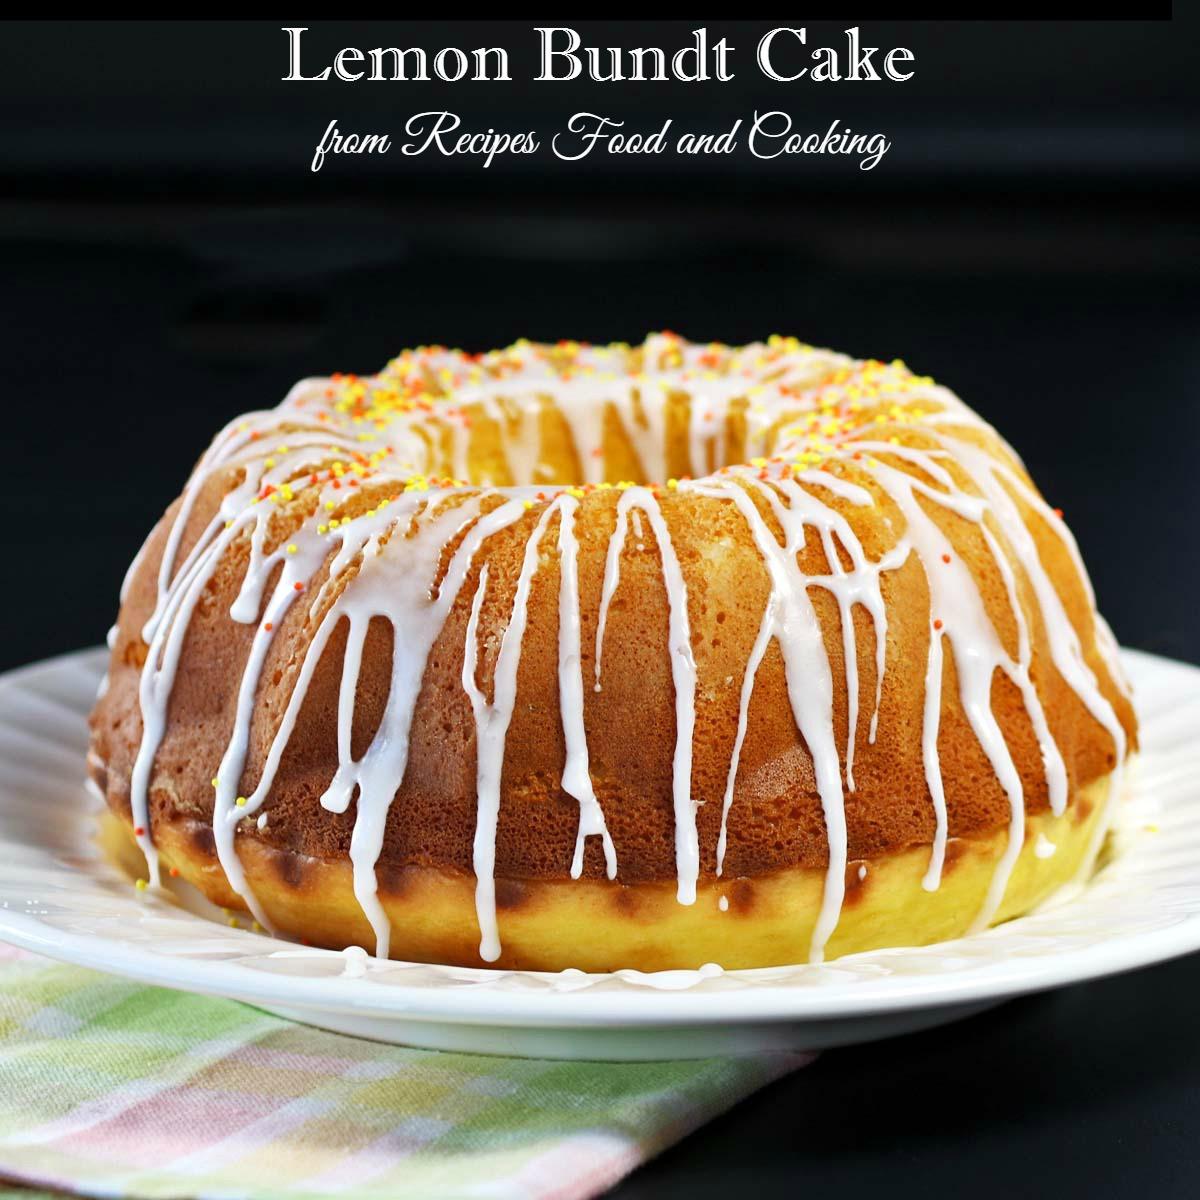 Lemon Bundt Cake From Cake Mix  Lemon Bundt Cake BundtBakers Recipes Food and Cooking